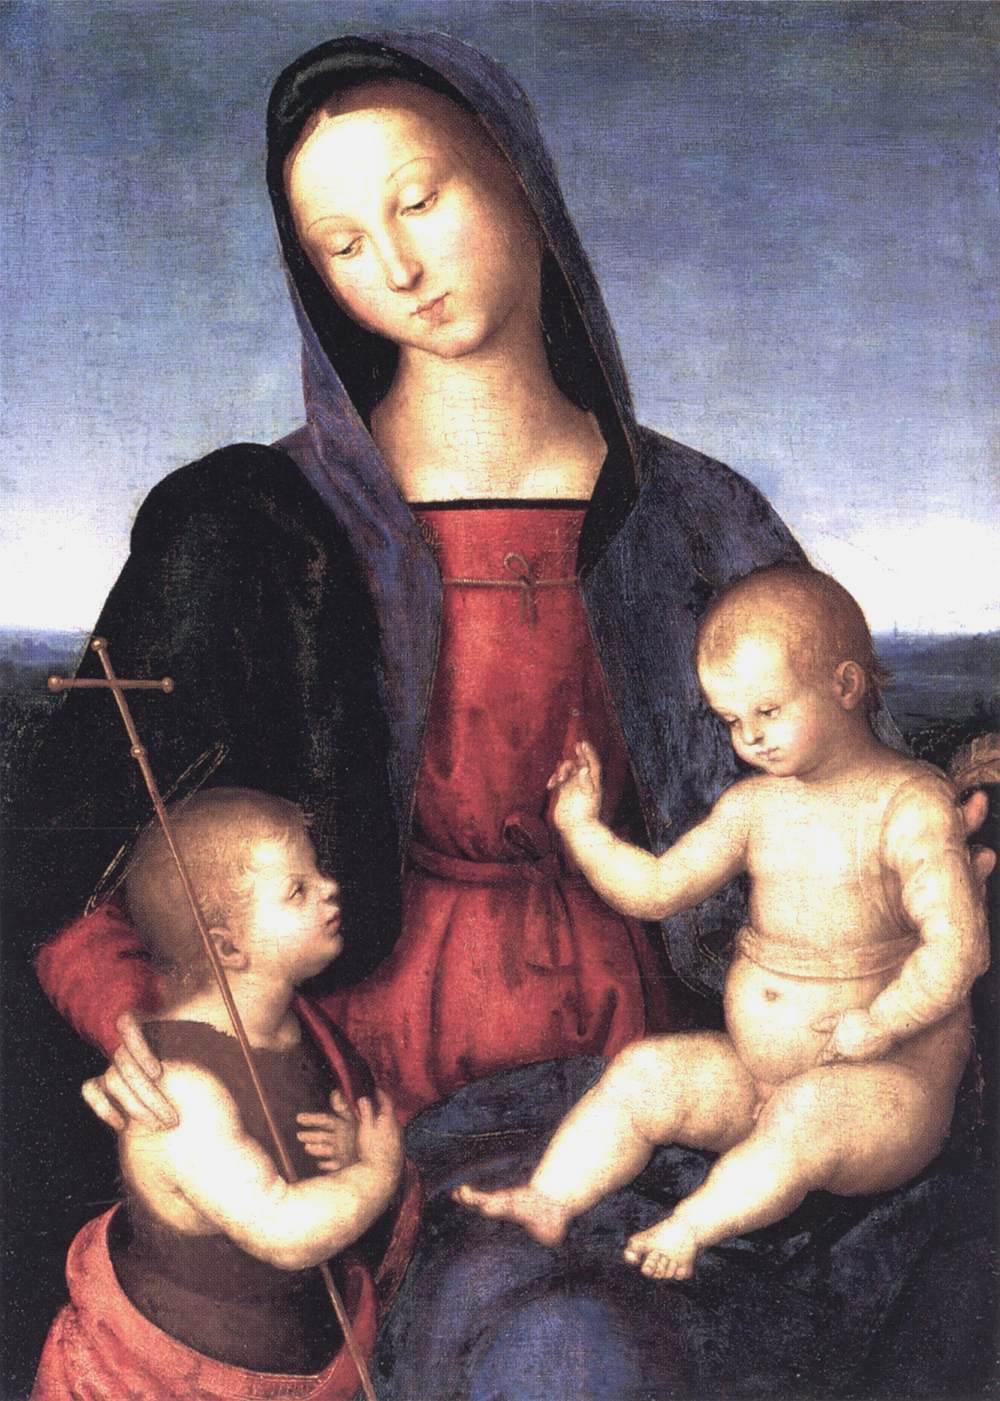 Diotalevi Madonna, 1503